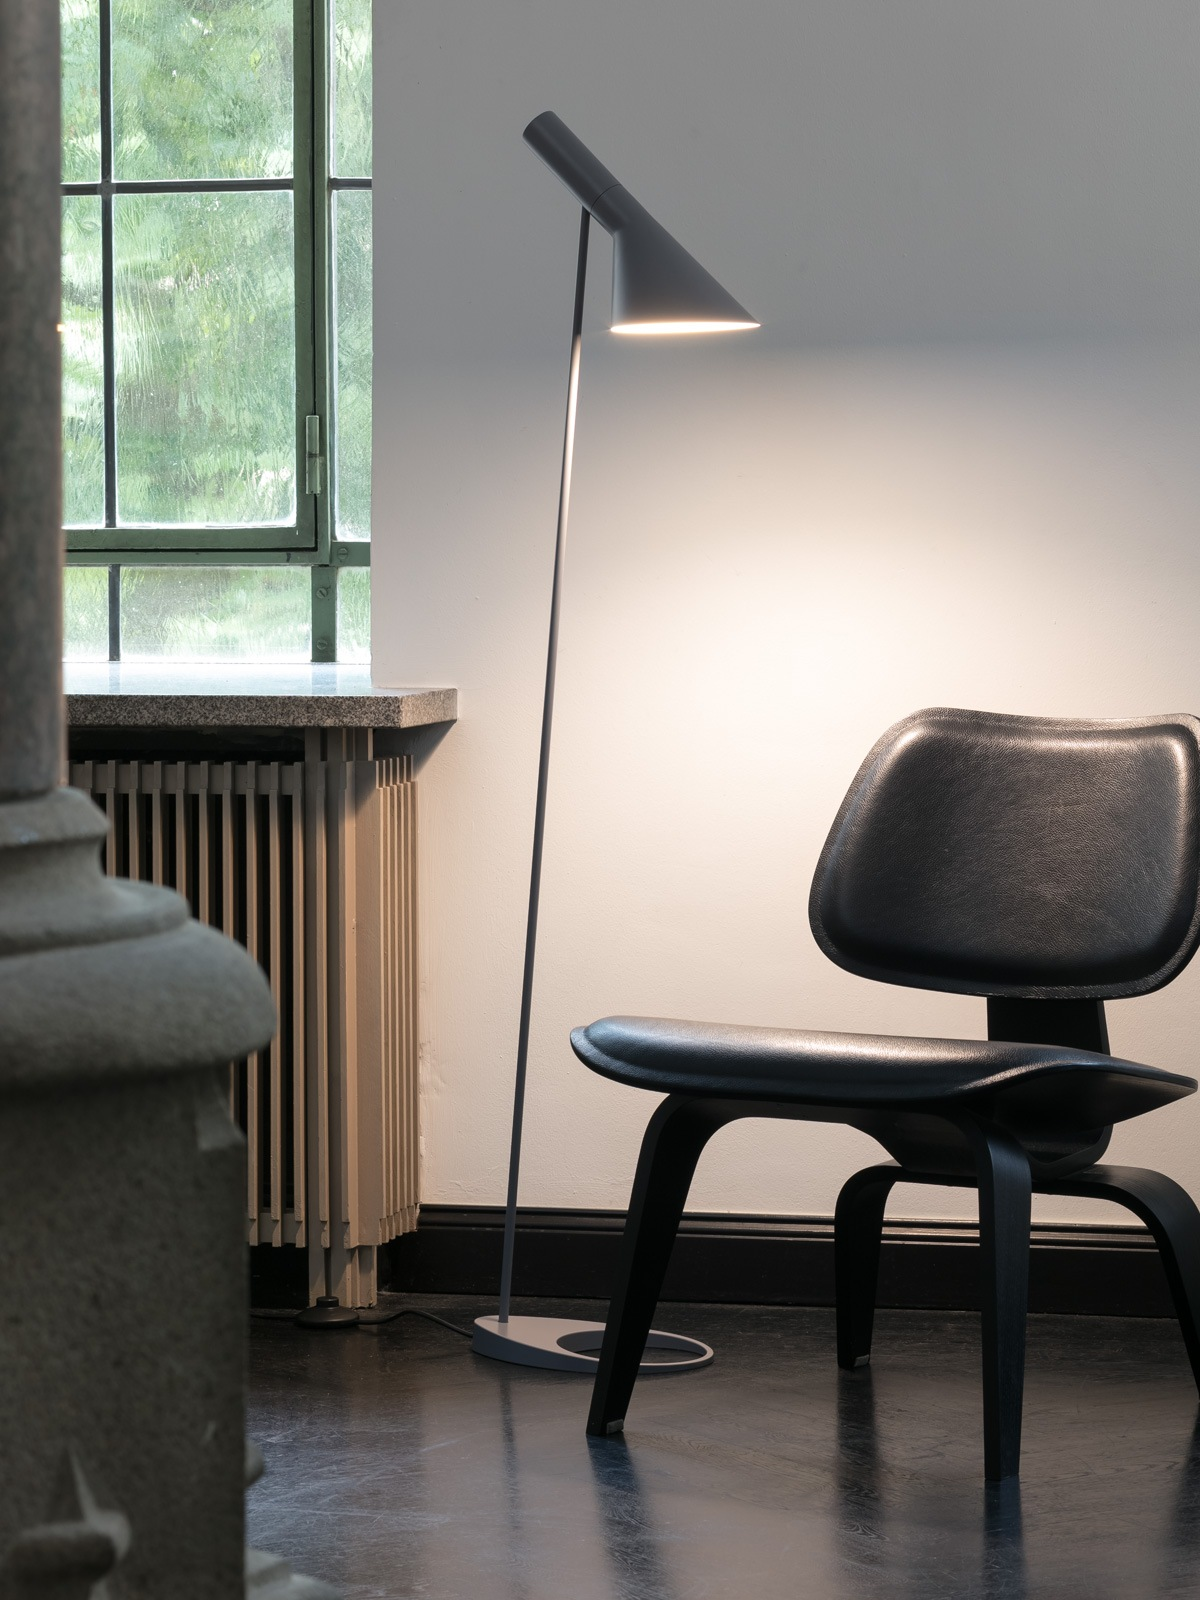 Louis Poulsen AJ Stehleuchte DesignOrt